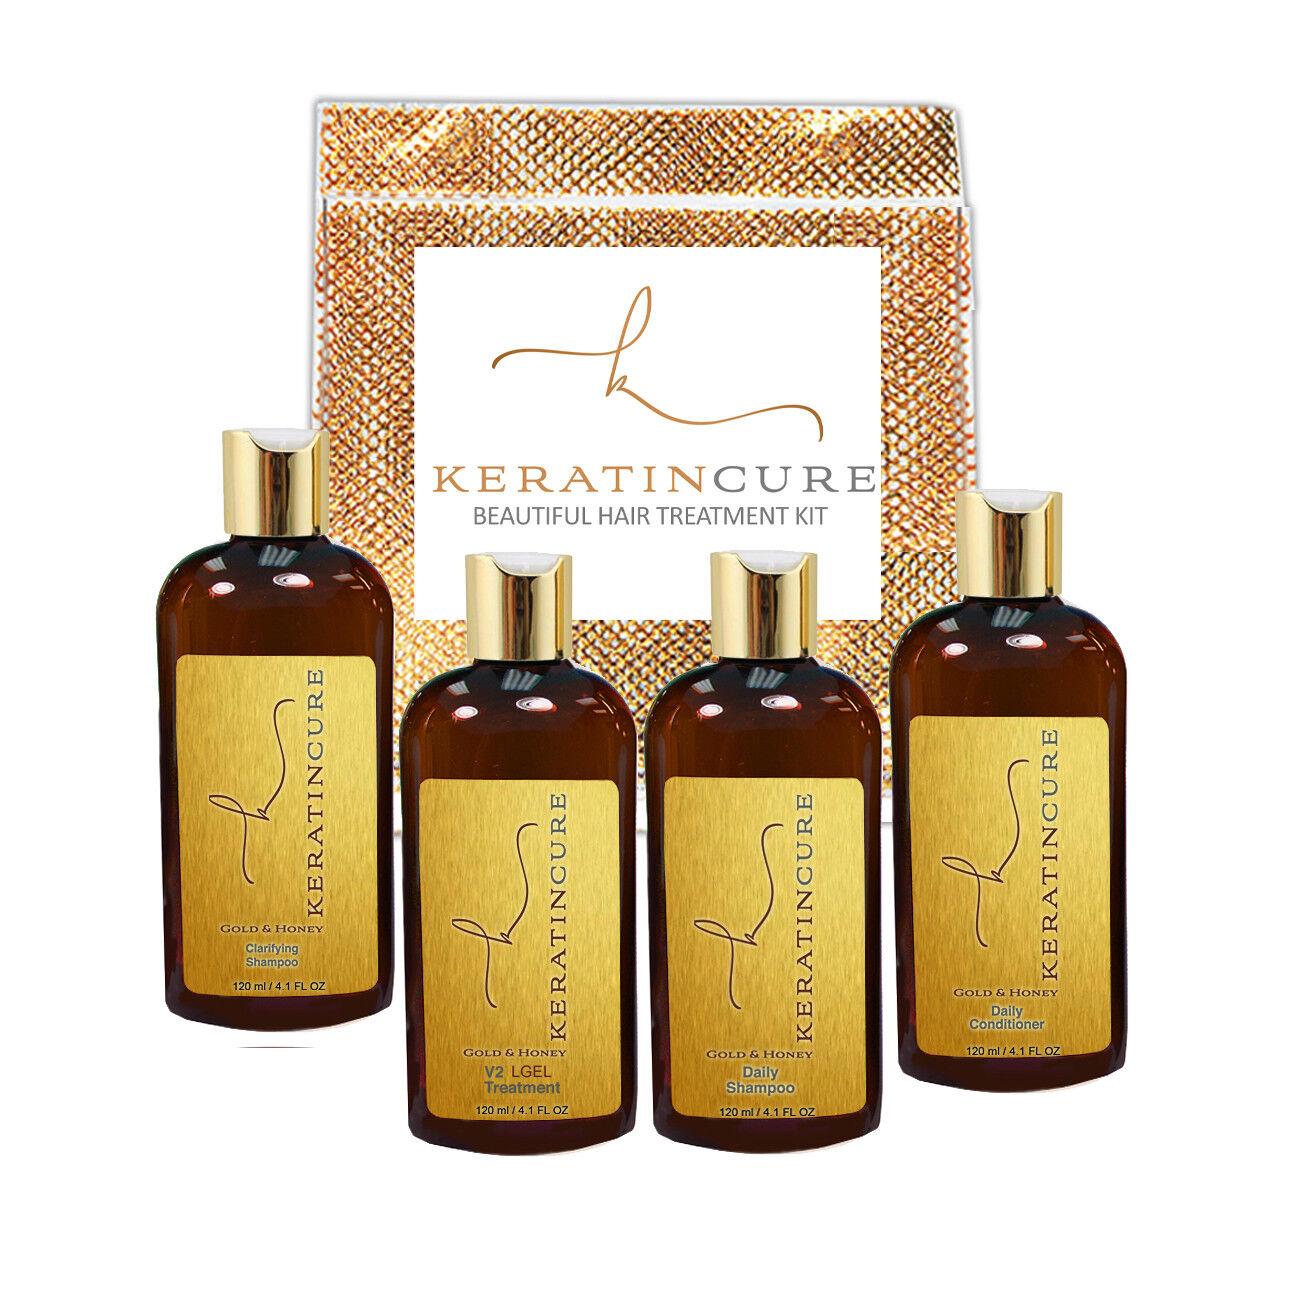 KERATIN CURE GOLD & HONEY V2 CREME HAIR STRAIGHT TREATMENT 6